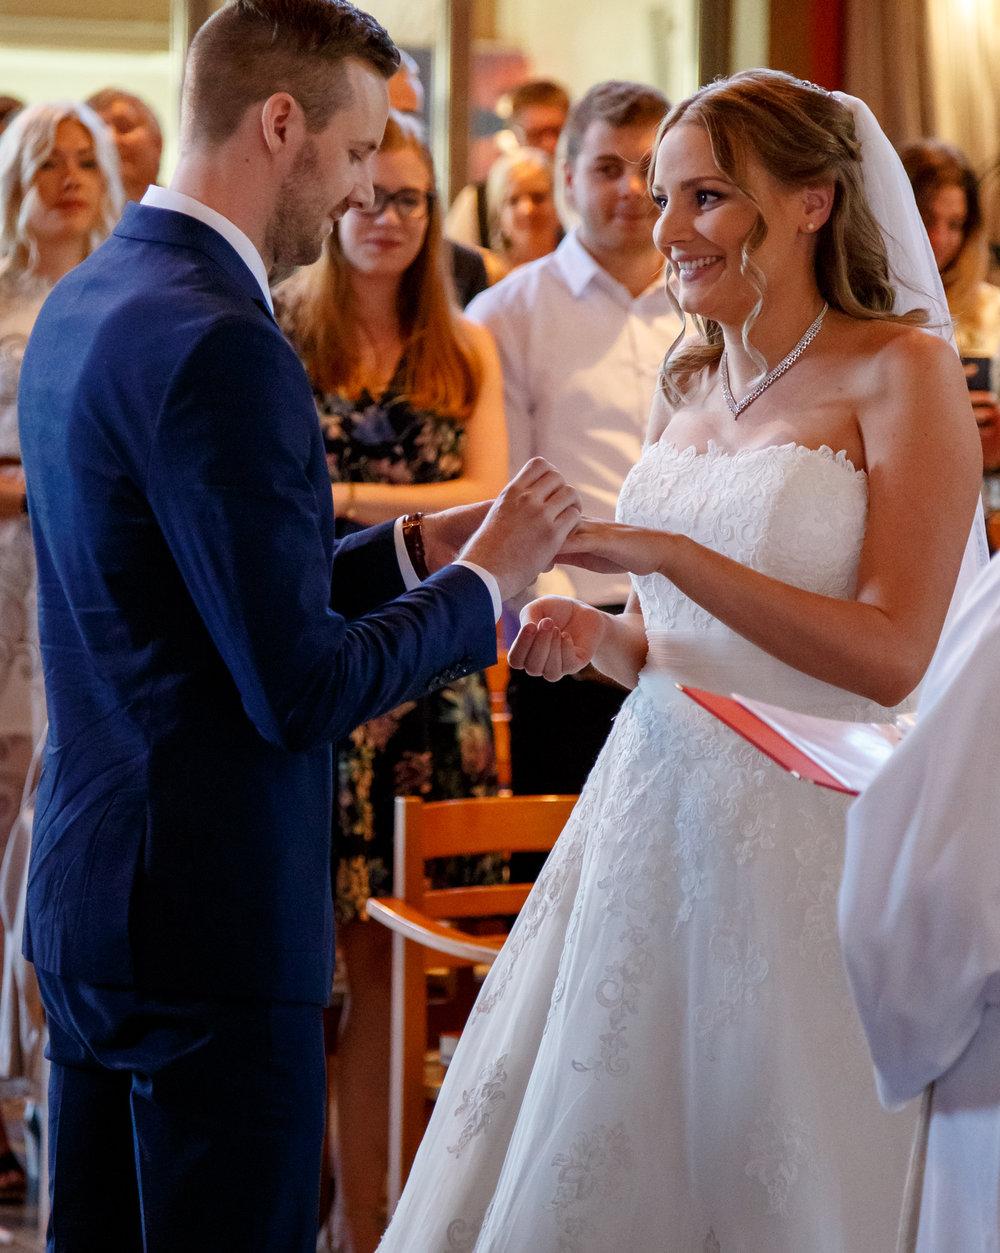 20180519-bröllop-fanny-daniel-157-2.jpg